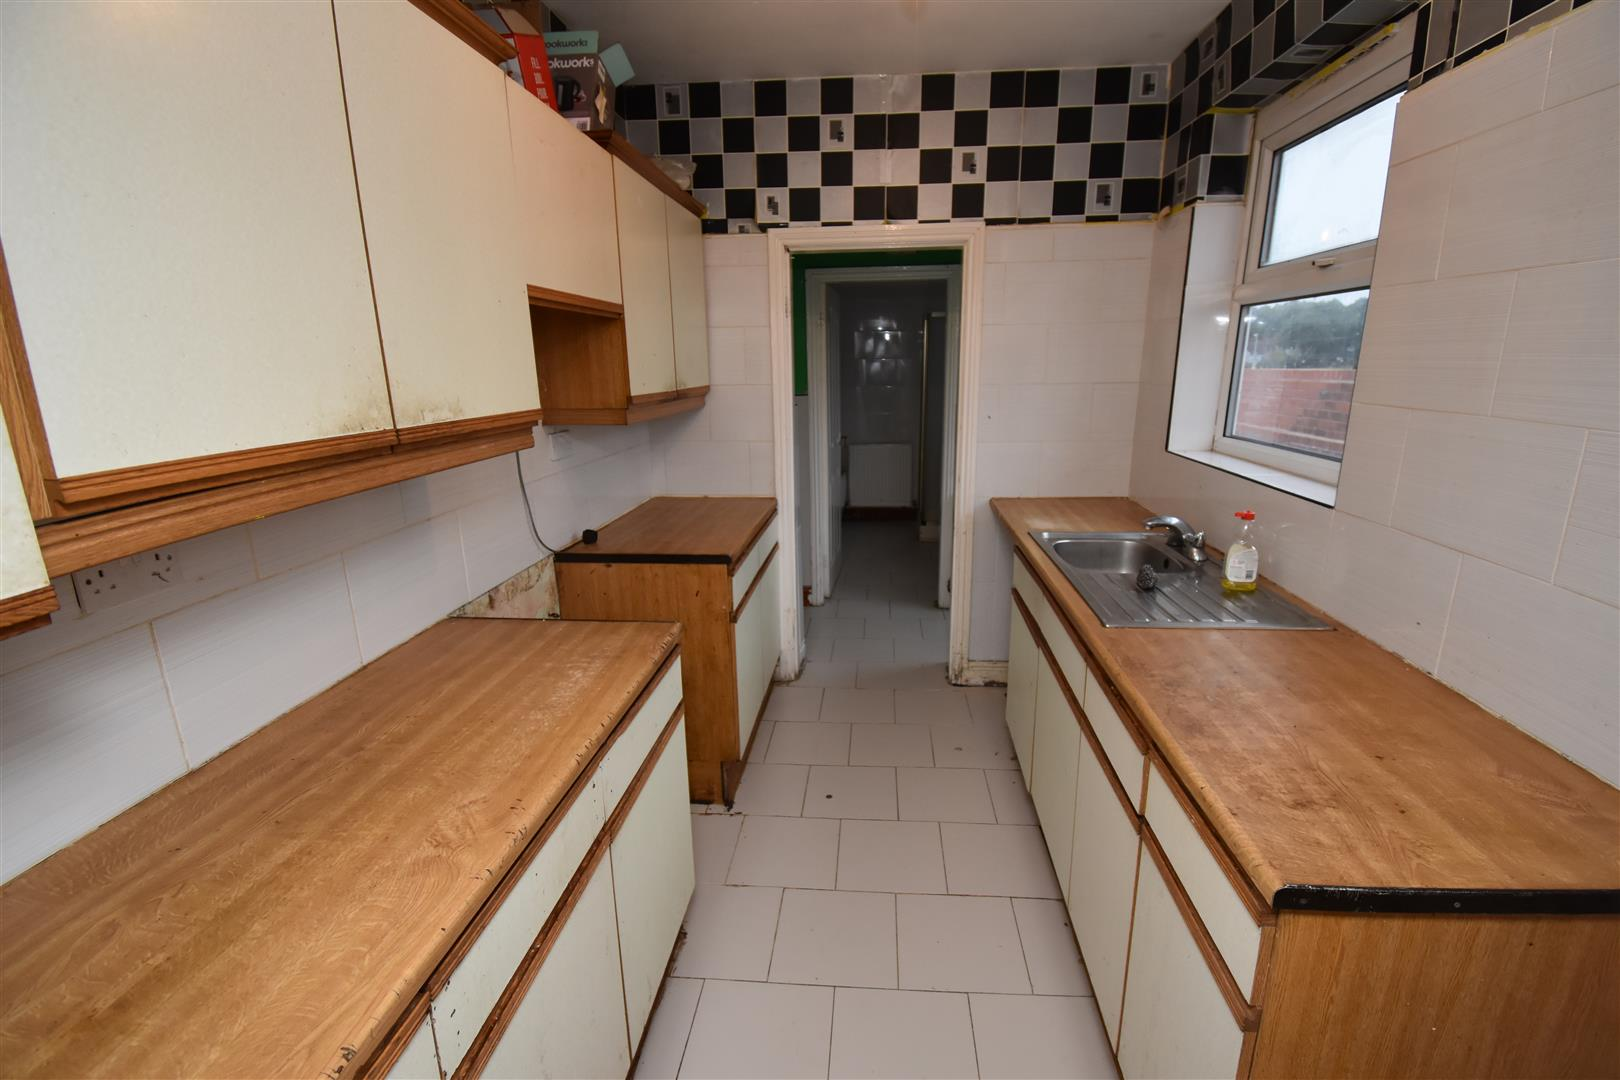 3 bed  for sale in Alderson Road, Alum Rock, Birmingham 4